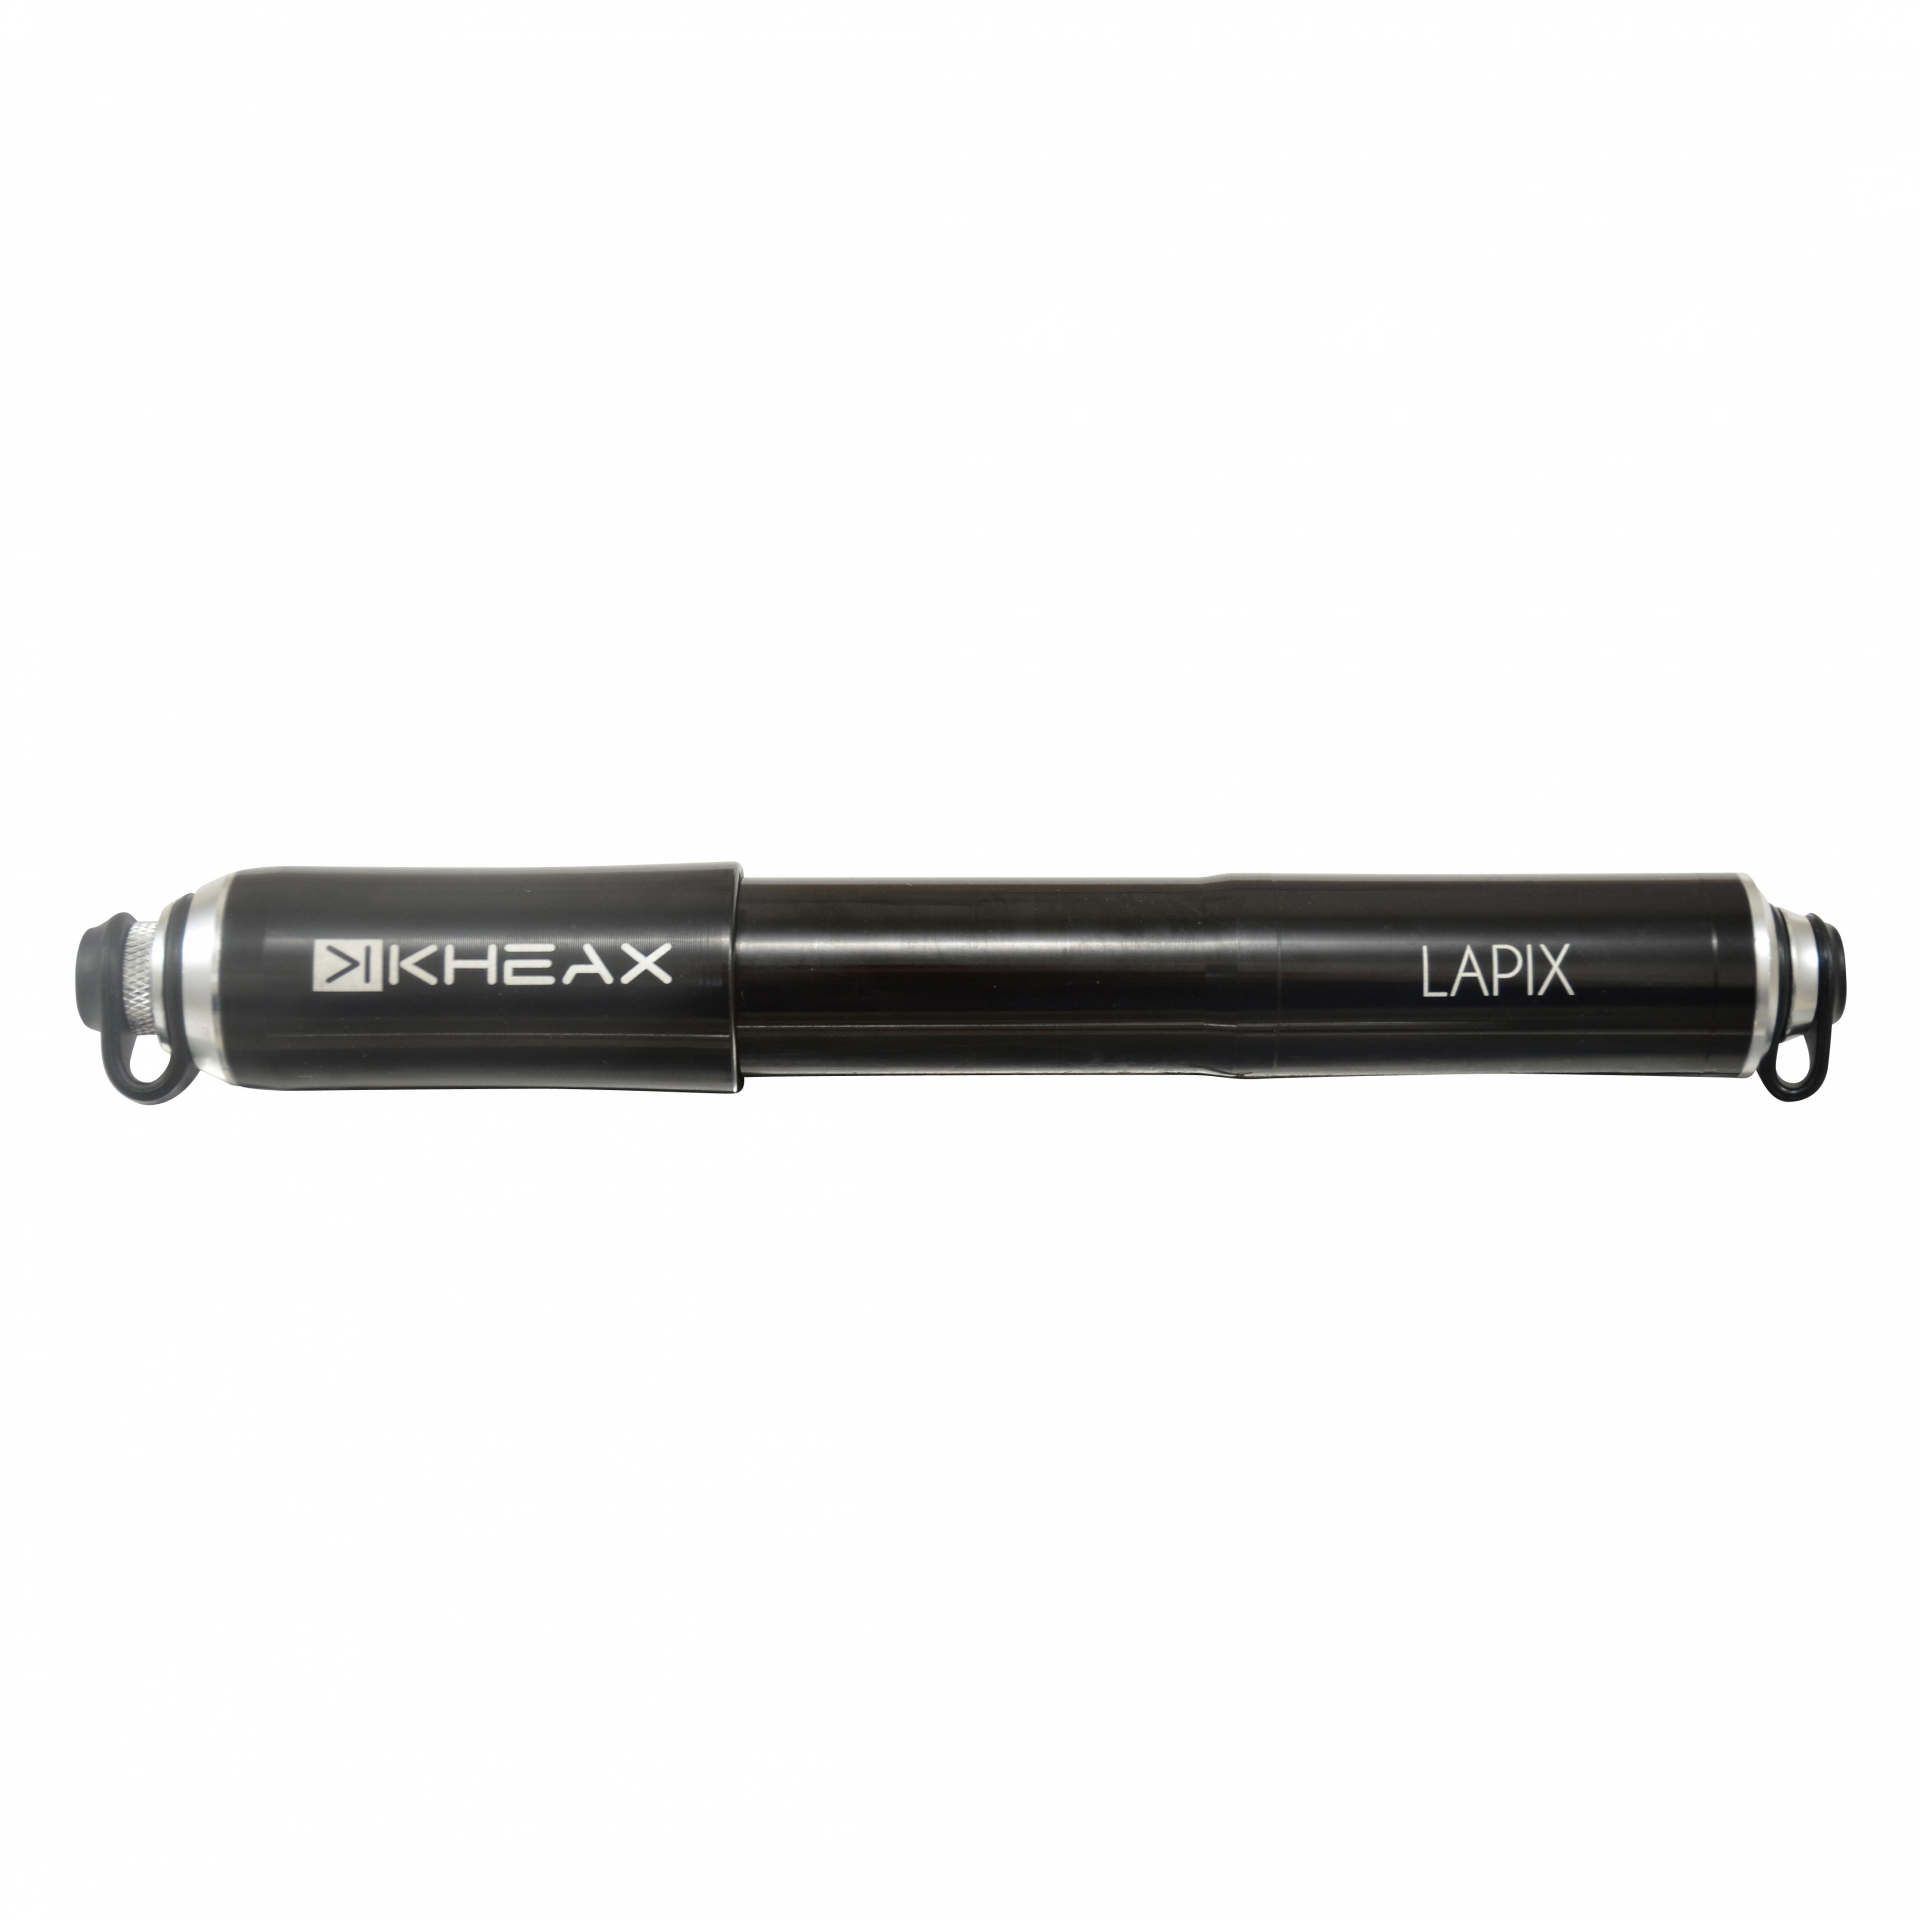 Mini pompe KHEAX Lapix VTT M Noir (225 mm)